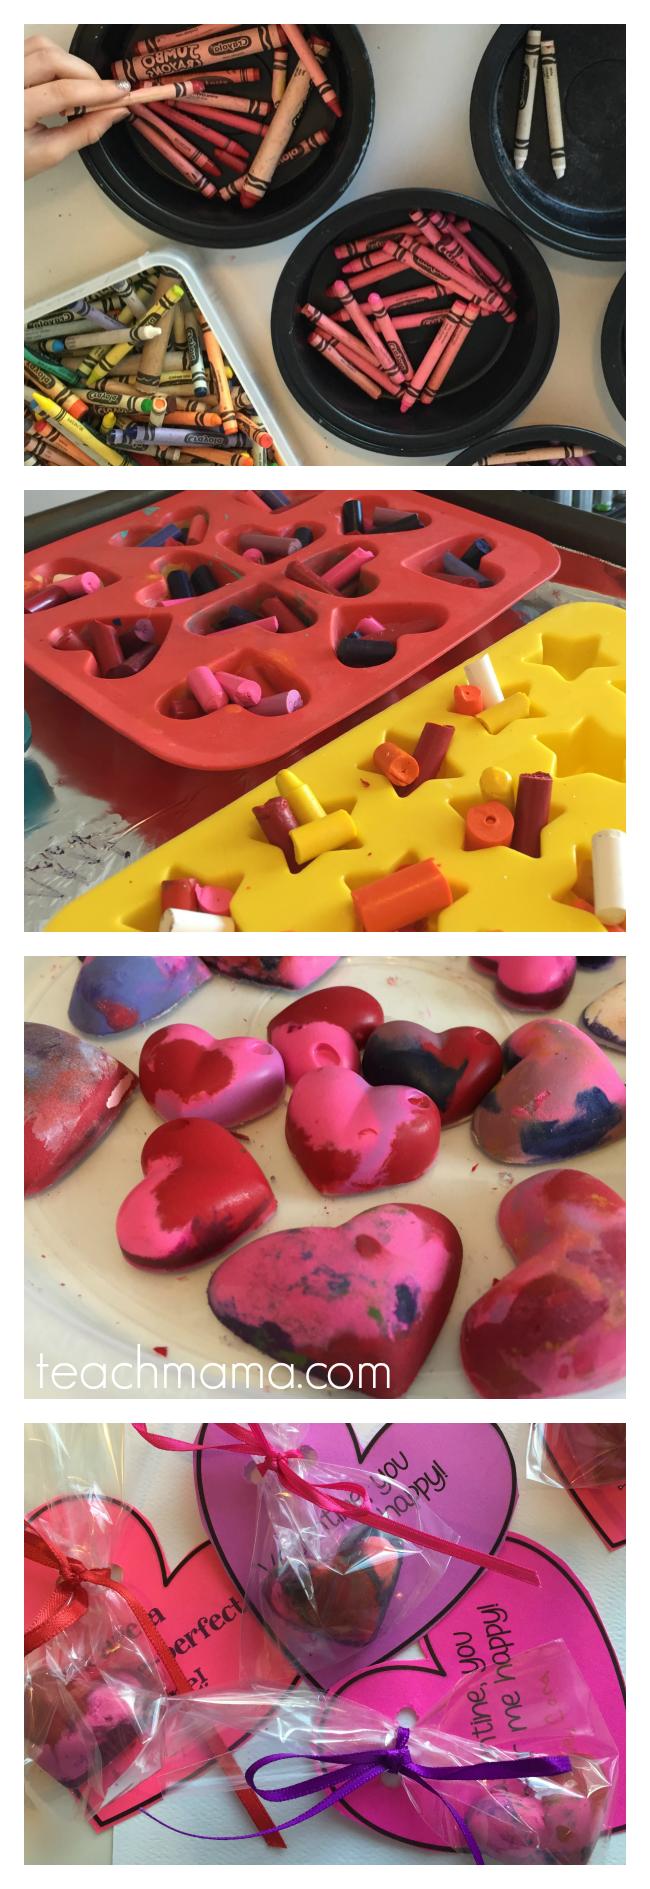 melted crayon valentines handmade valentines teachmama.com